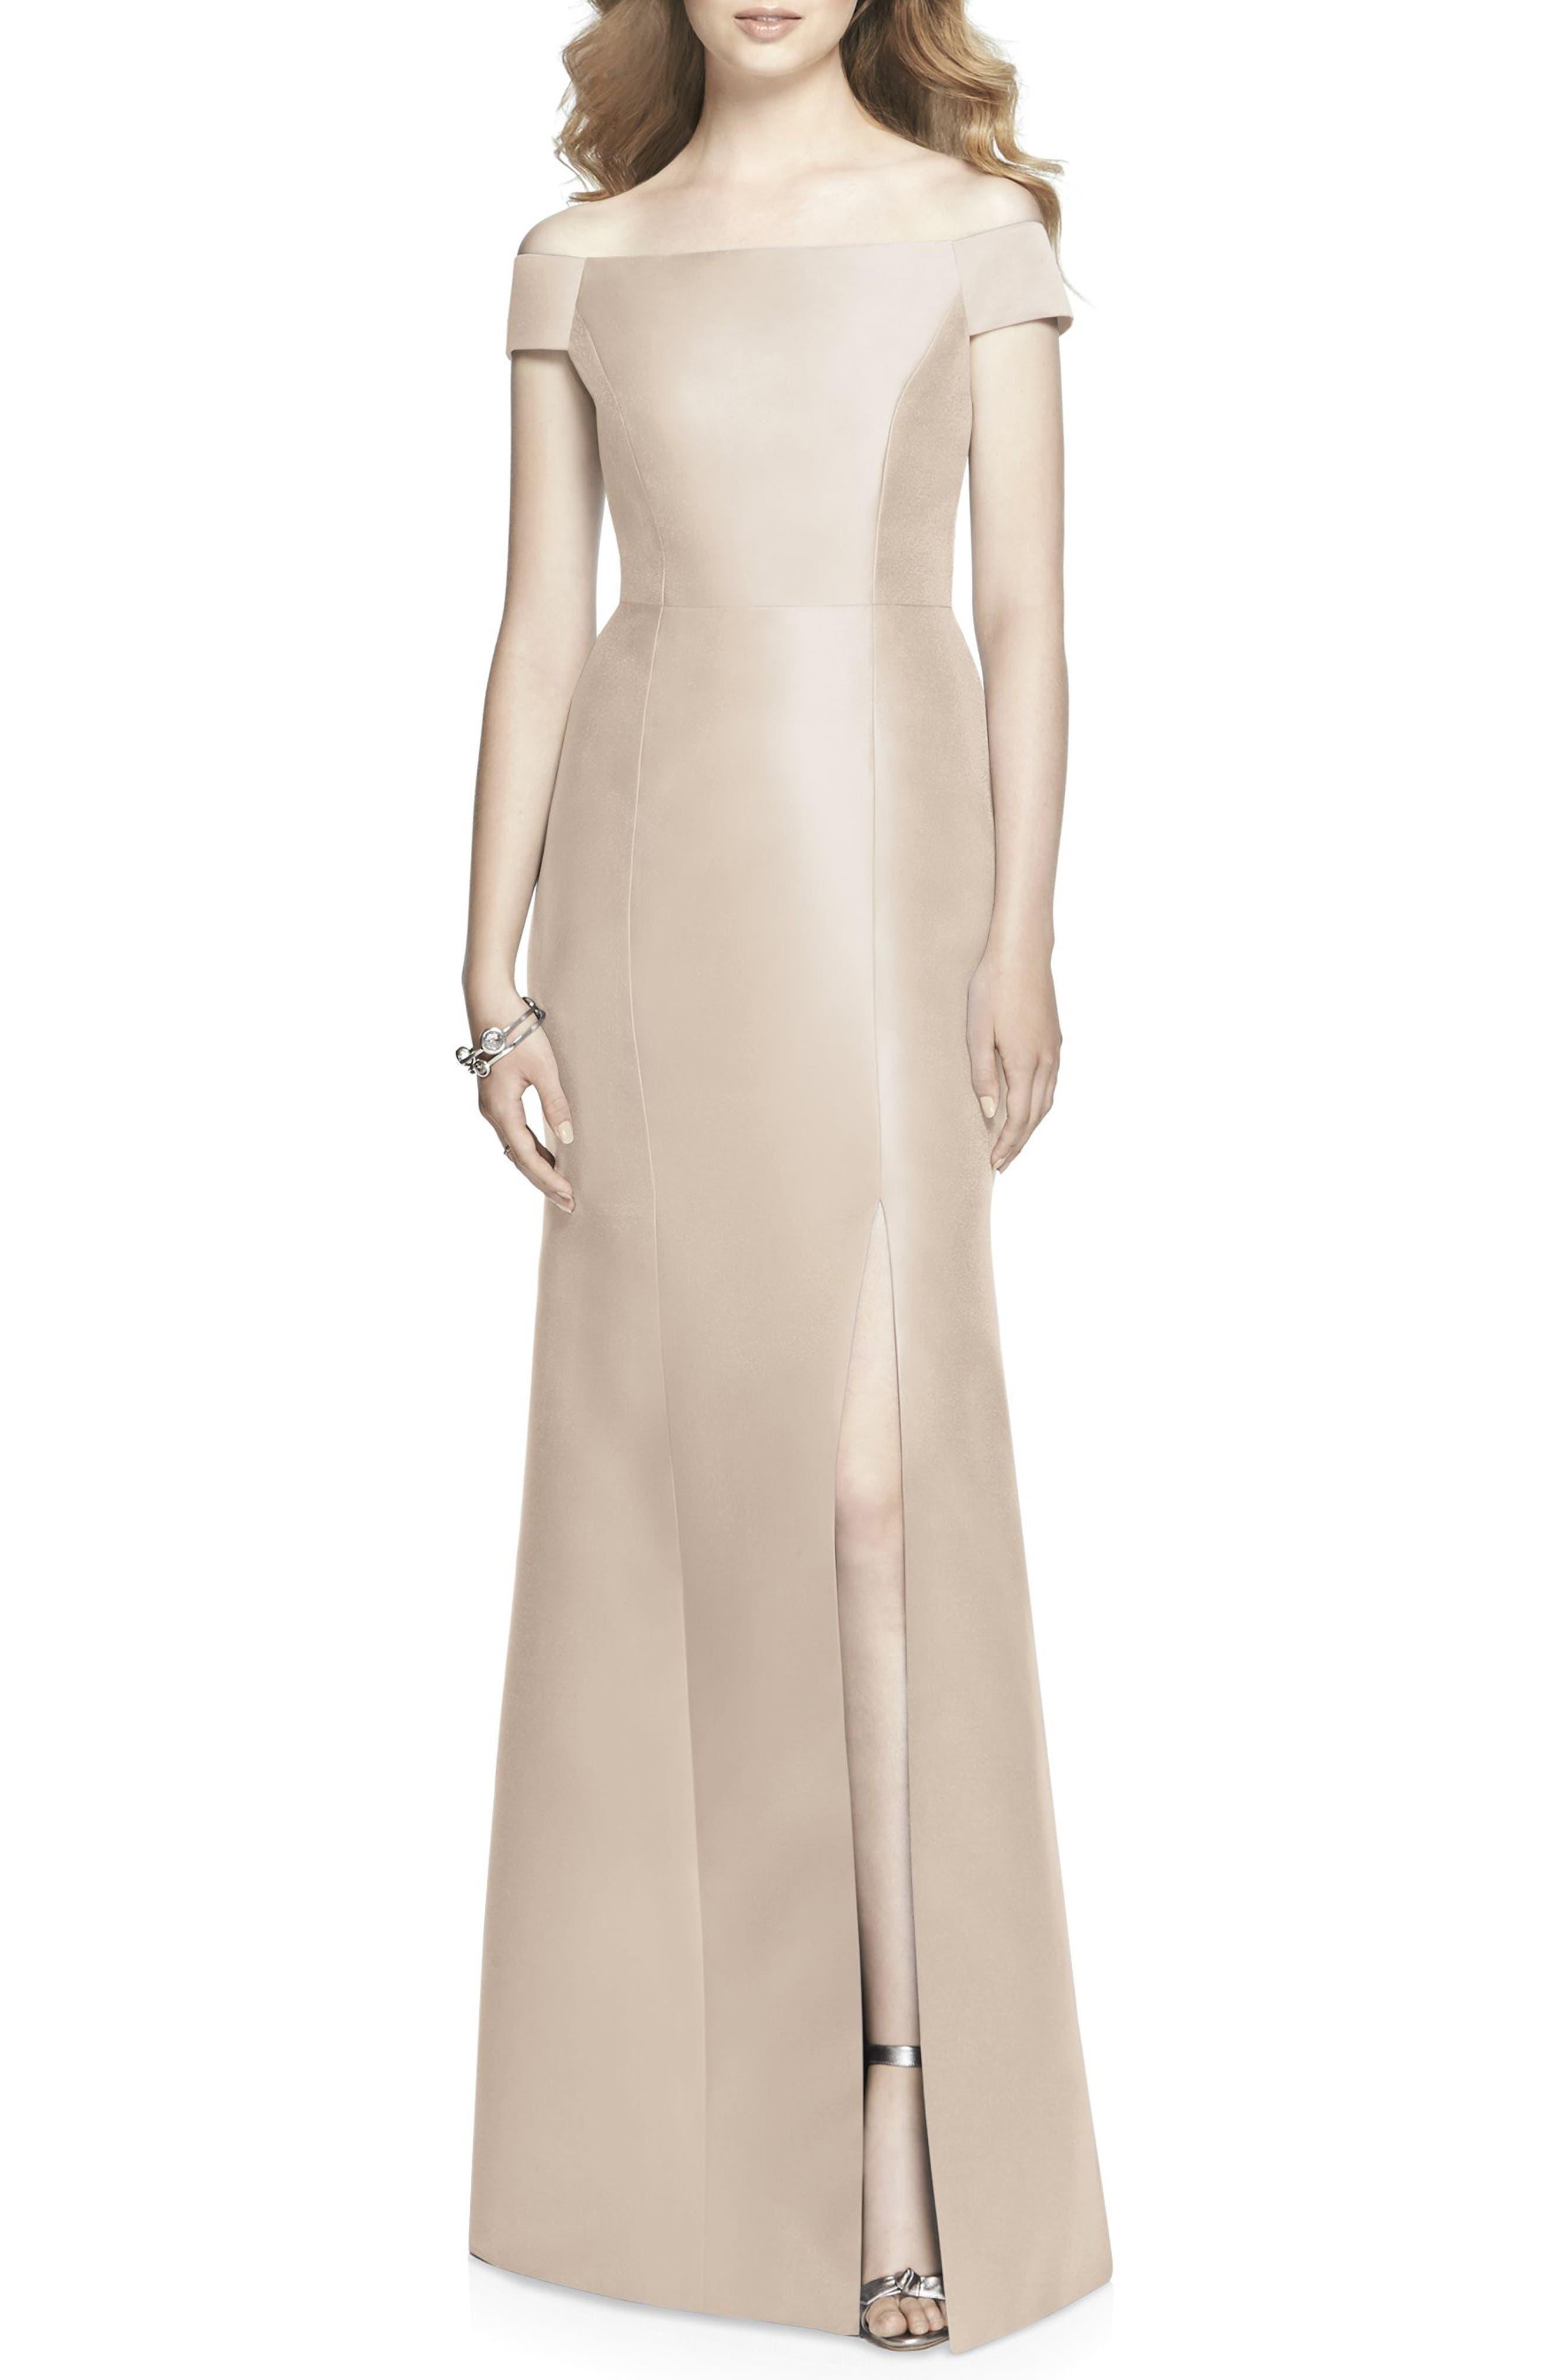 262399bac9b Women s Off The Shoulder Sale Dresses